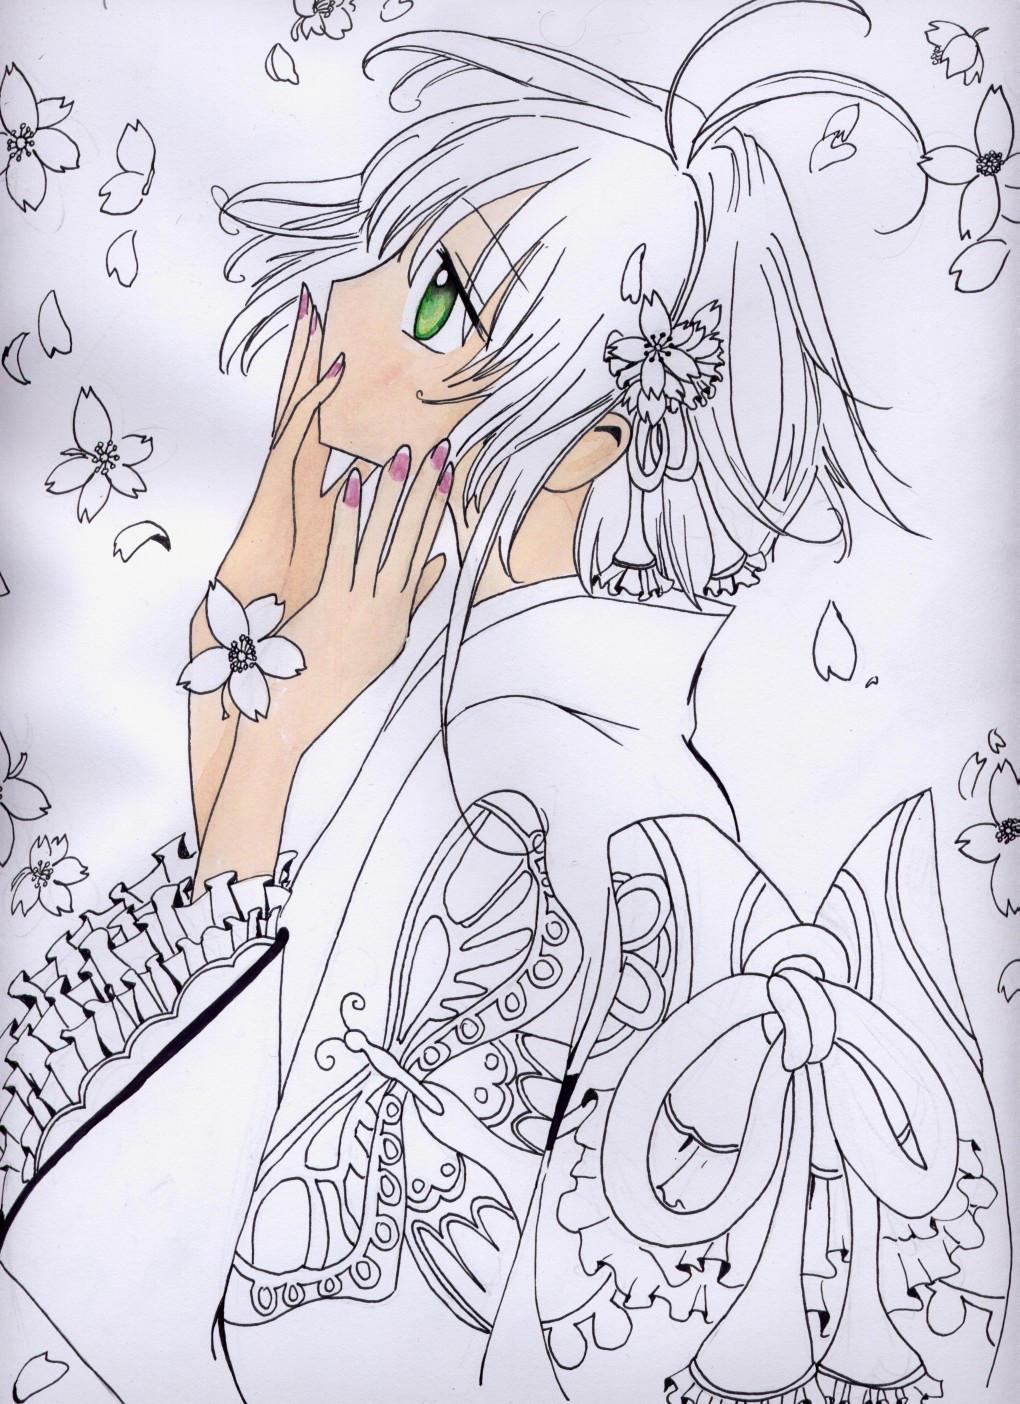 +Next...+ Sakura's Hope by kanda-cgroom